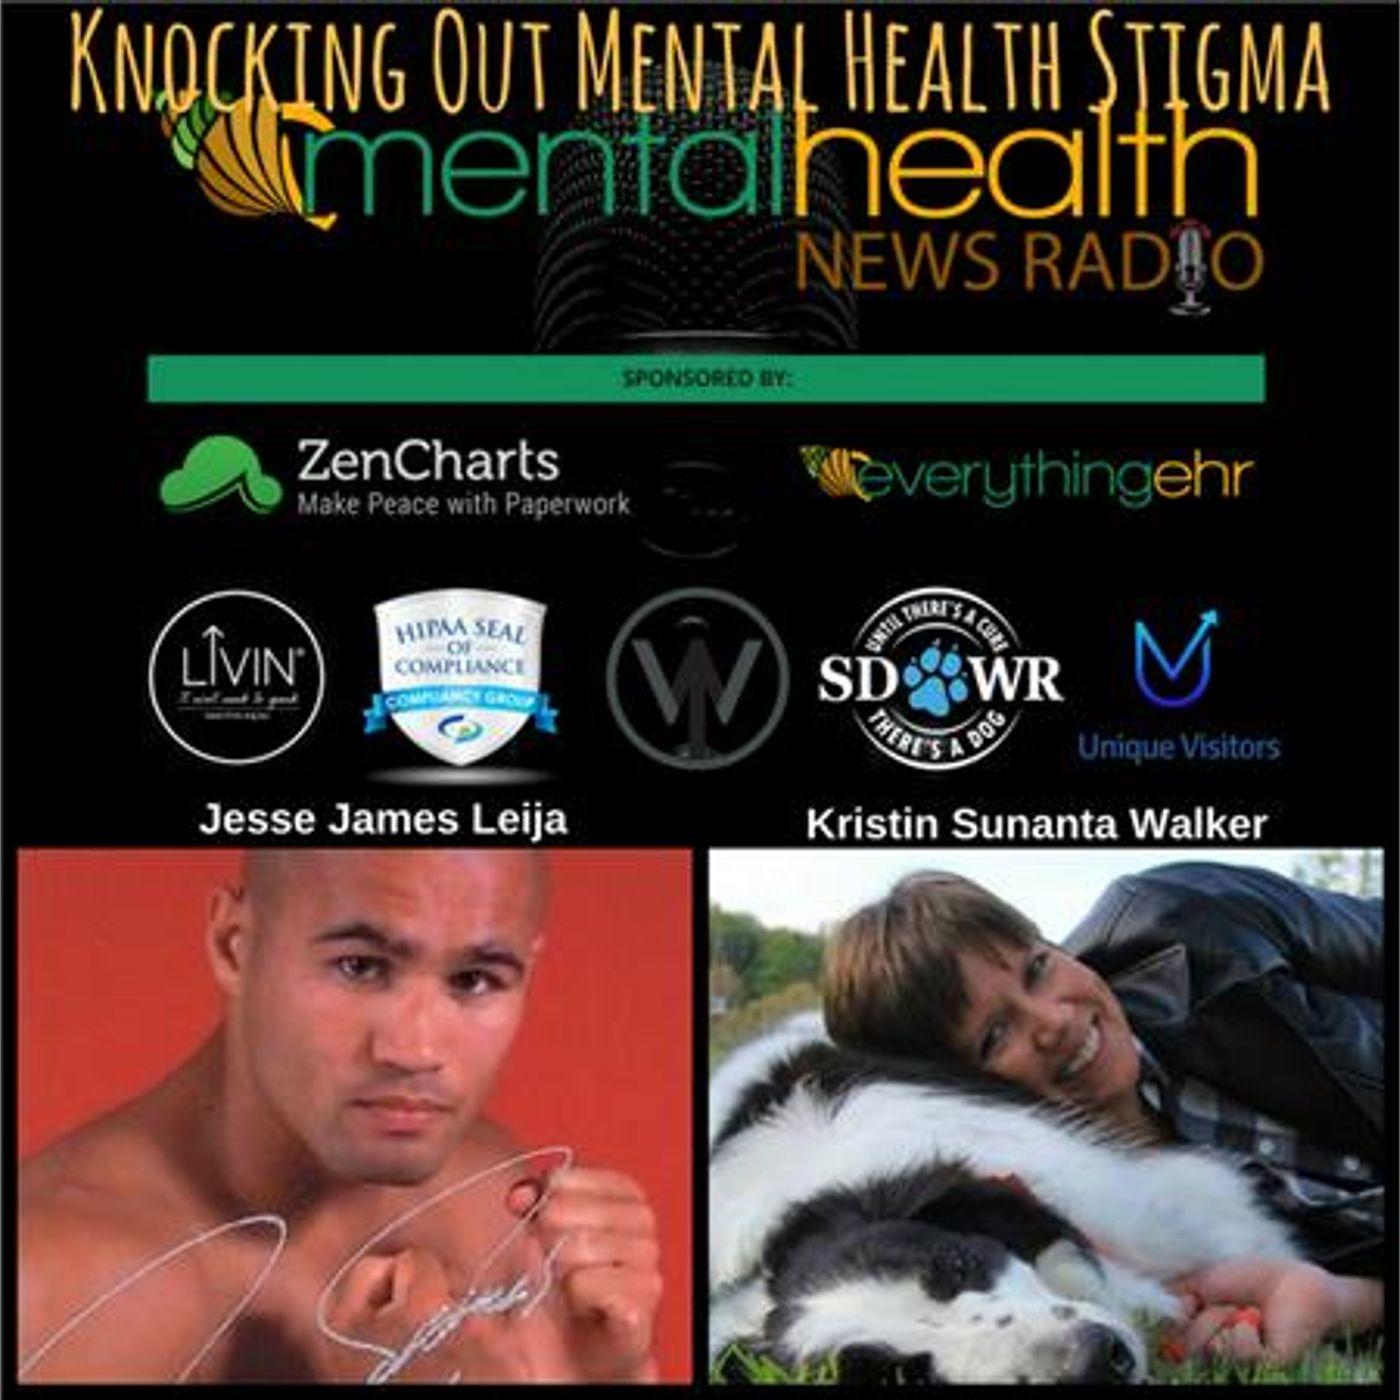 Mental Health News Radio - Knocking Out Mental Health Stigma with Jesse James Leija